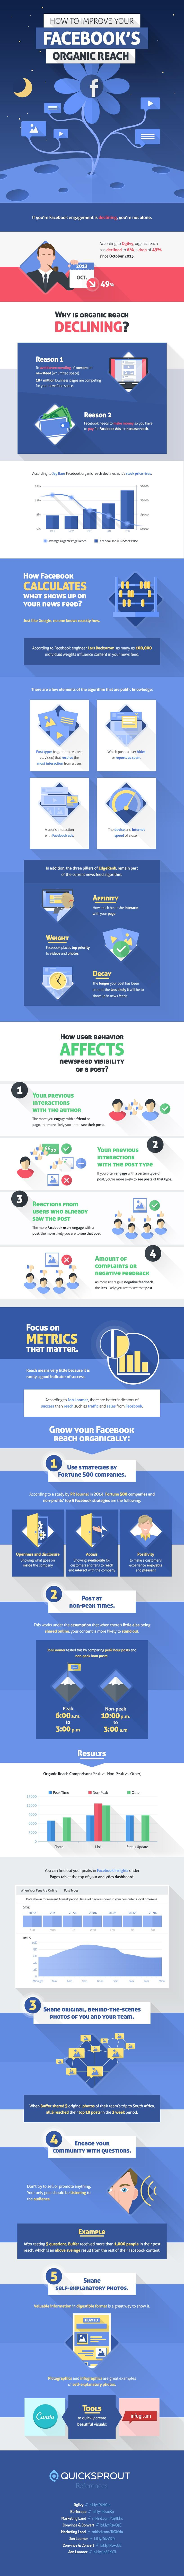 How-to-Improve-Your-Facebooks-Organic-Reach.jpg